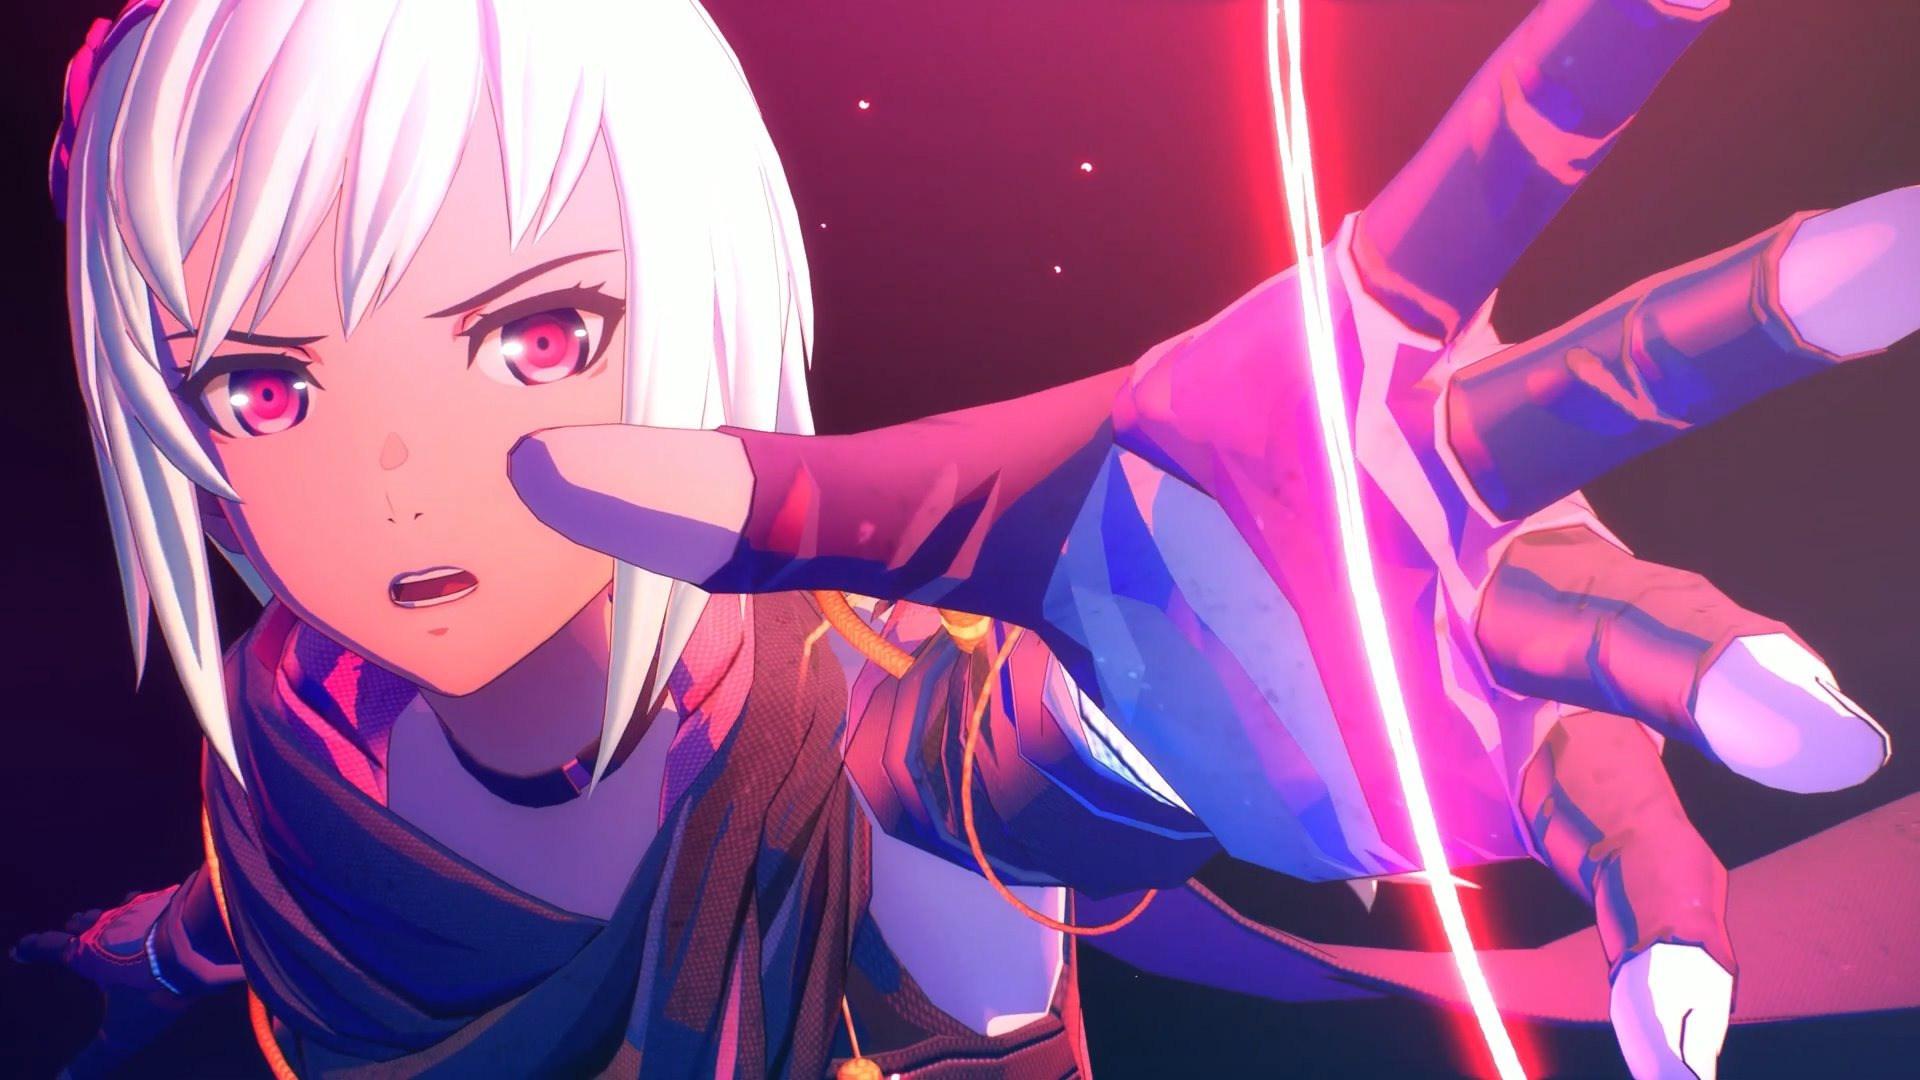 Trailer, actionspiel, Rollenspiel, Bandai Namco, Anime, JRPG, Scarlet Nexus